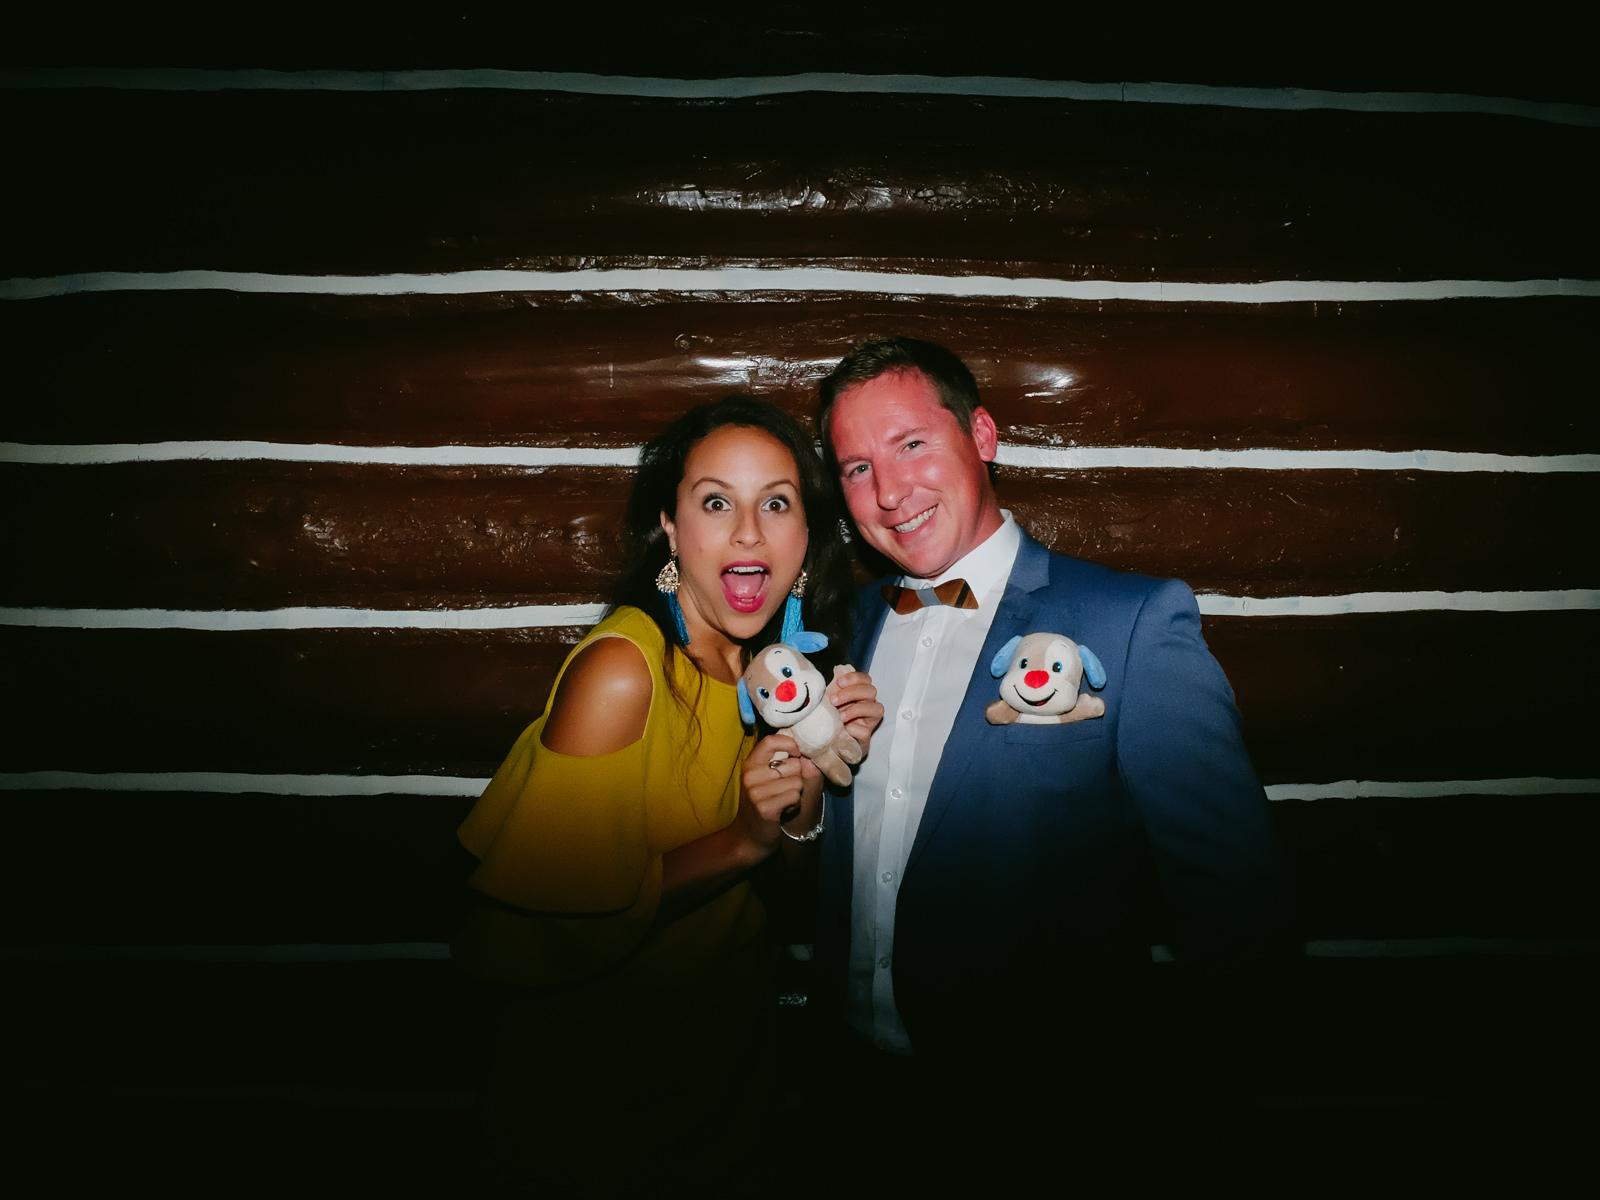 A pictou lodge wedding